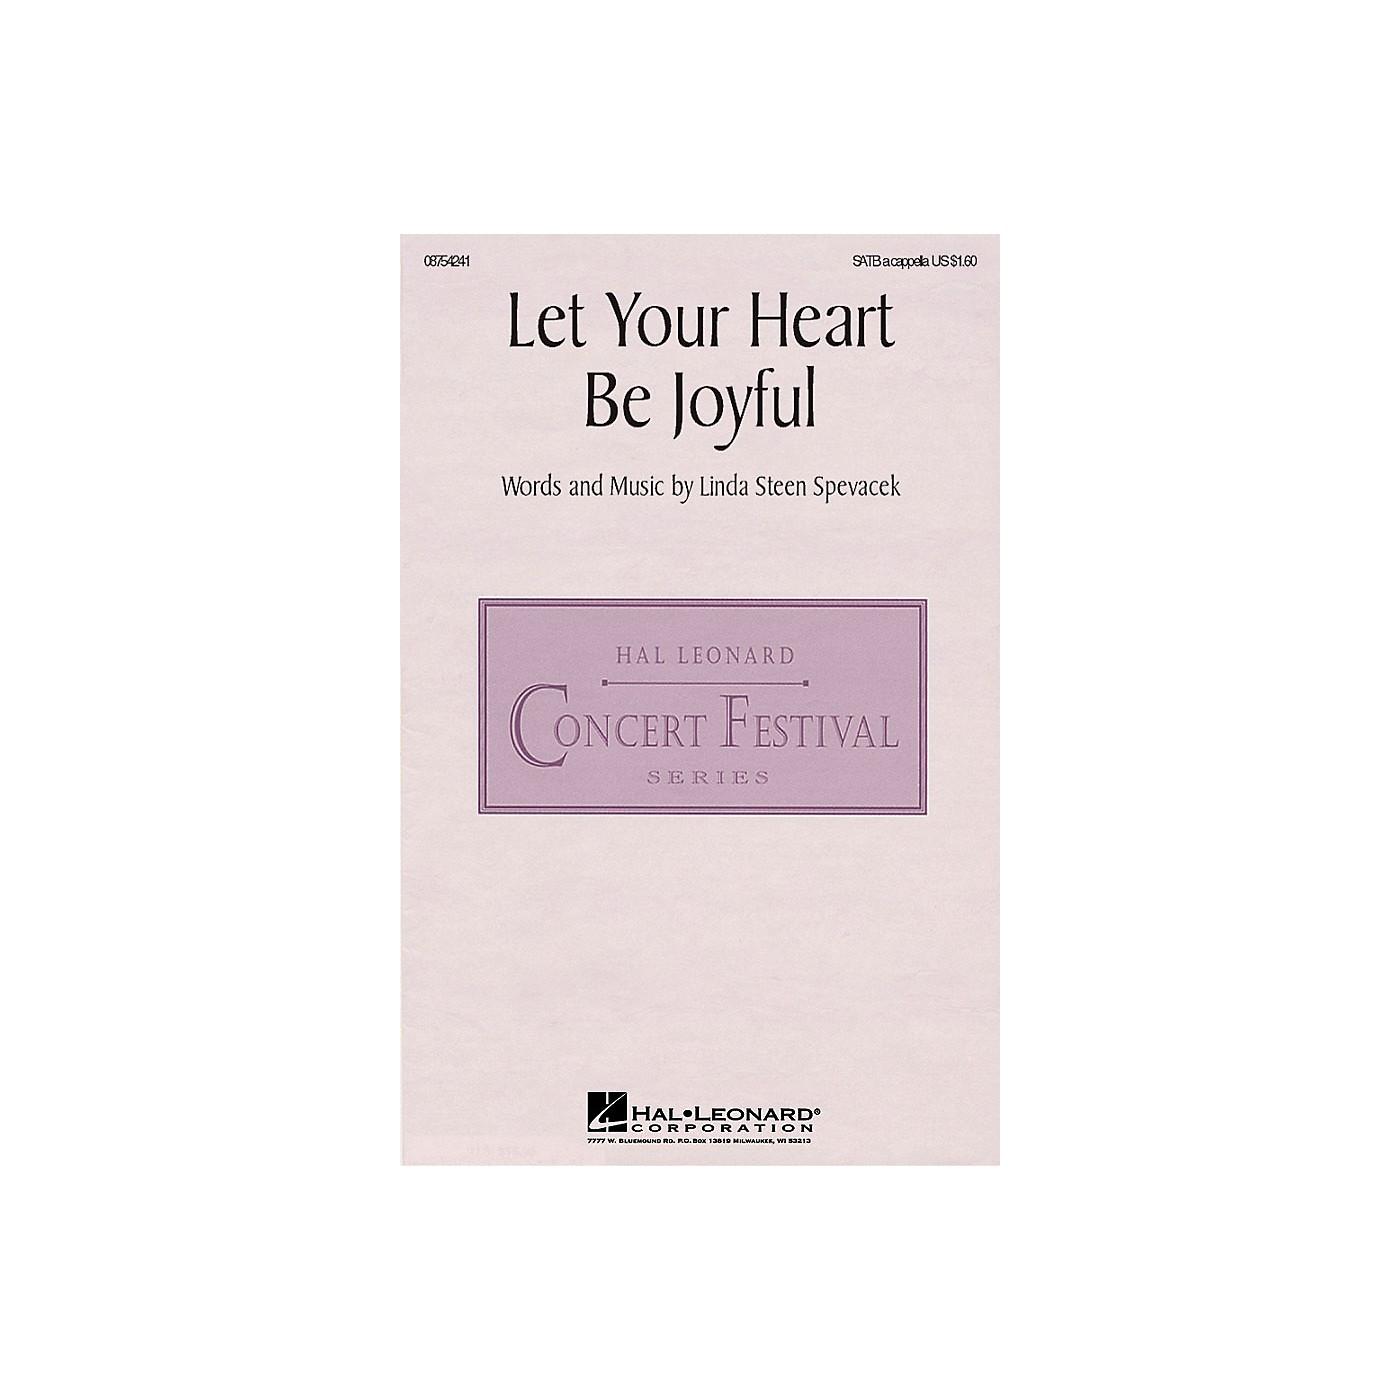 Hal Leonard Let Your Heart Be Joyful SATB a cappella composed by Linda Spevacek thumbnail